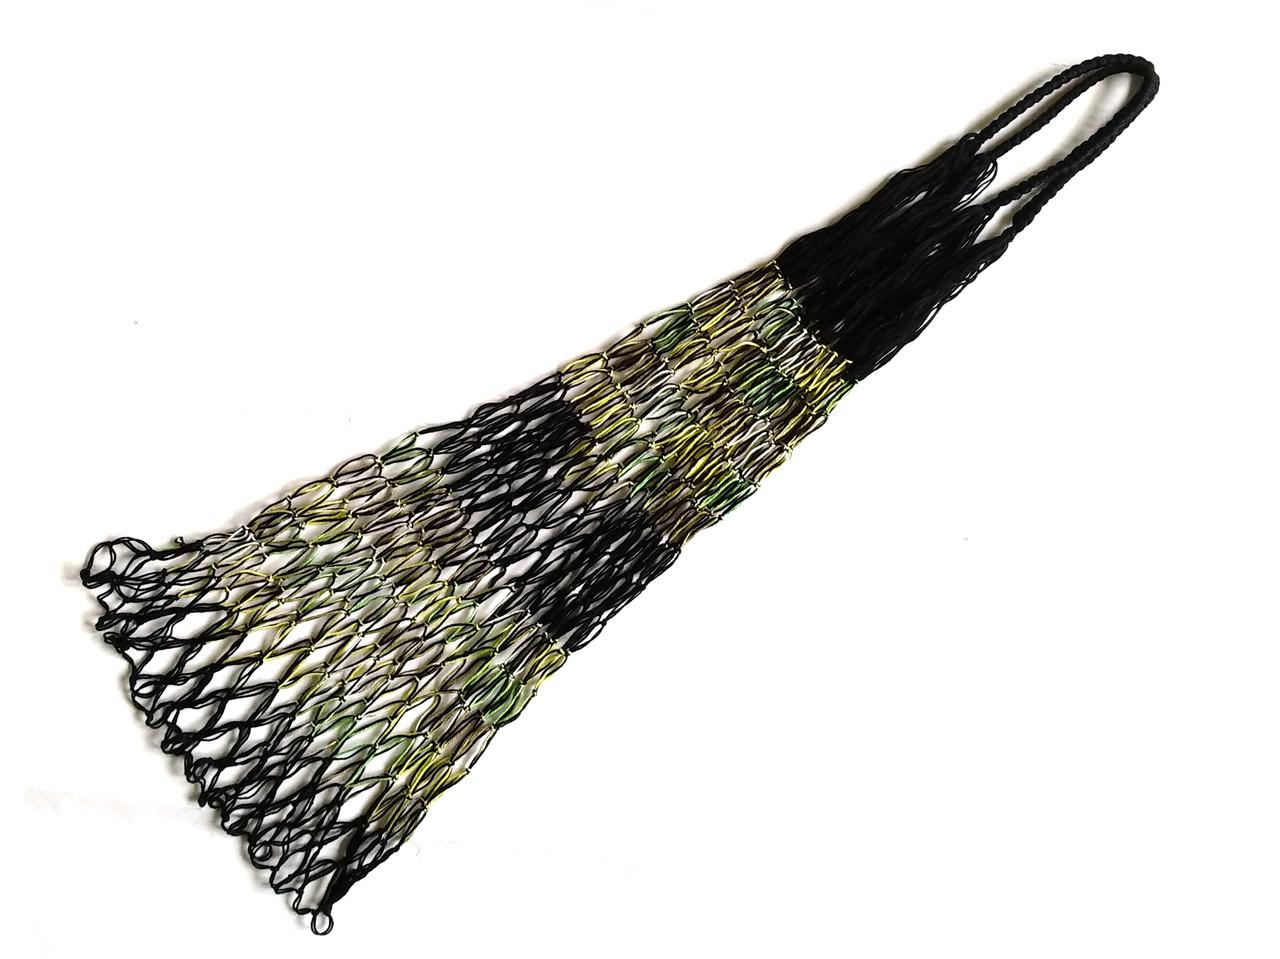 Эко сумка -  Эксклюзивная сумка - Шопер сумка -  Французская сумка